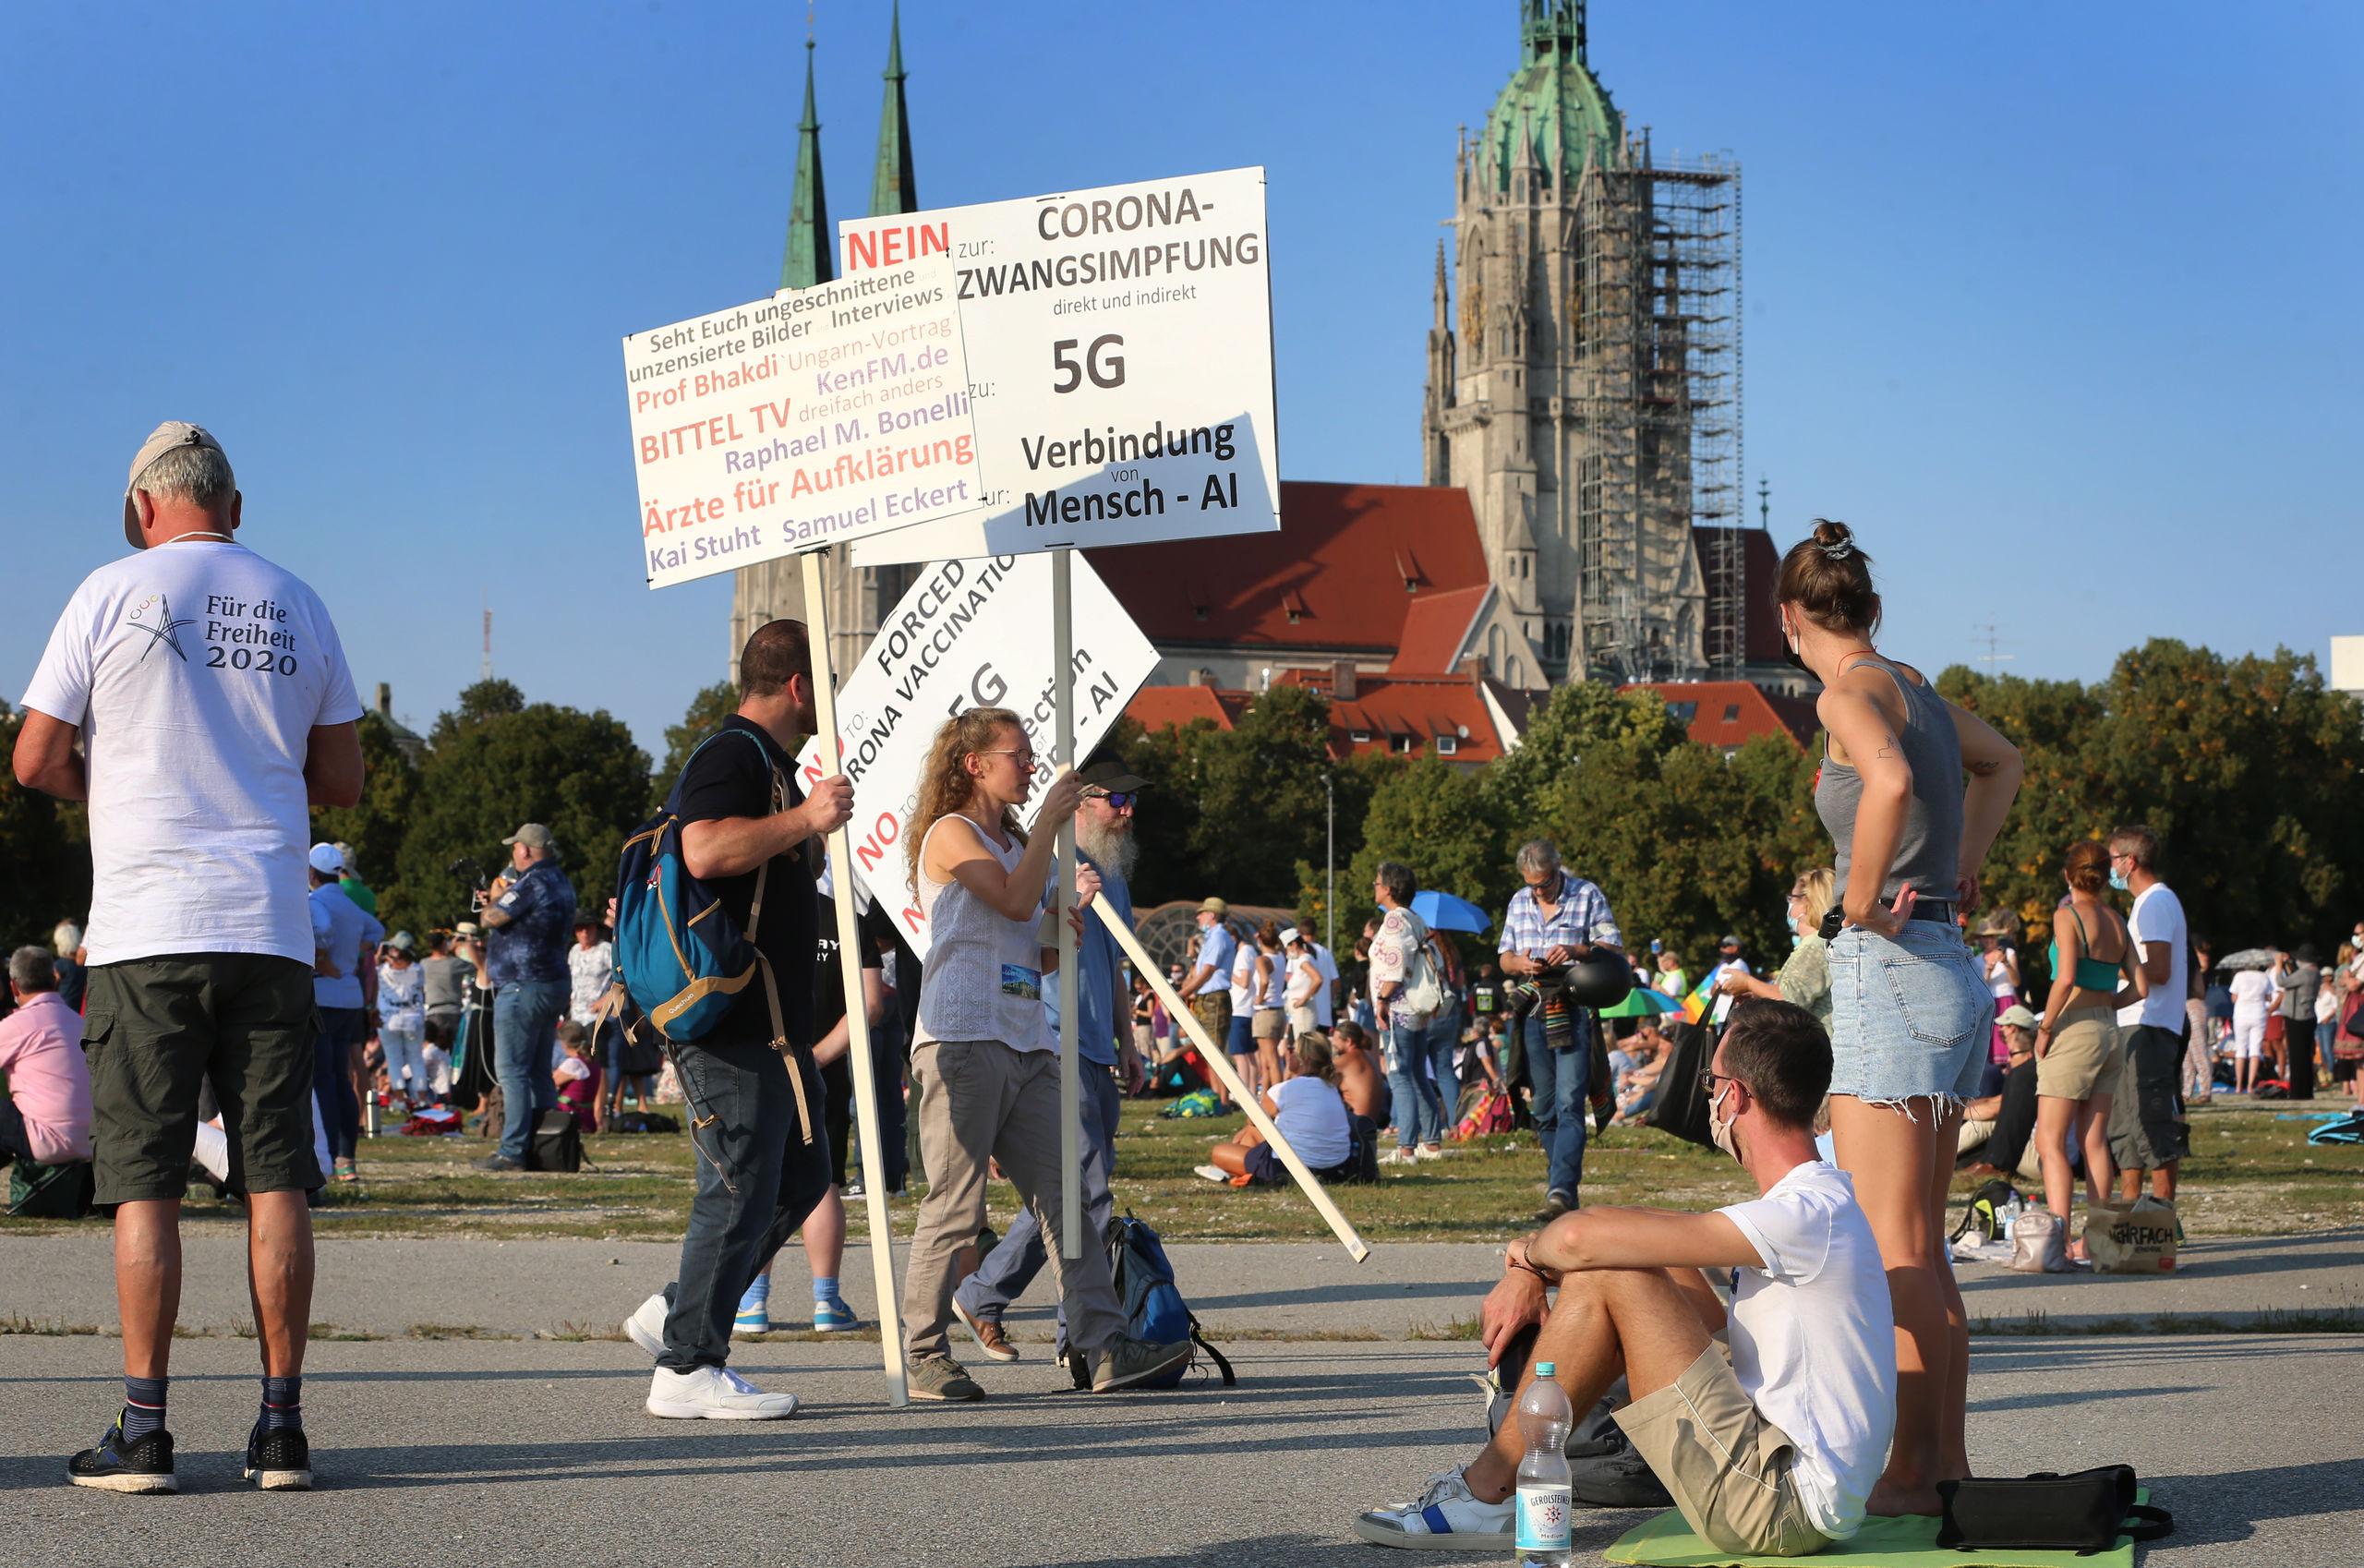 antivacunas-munich-protesta-210521.jpg